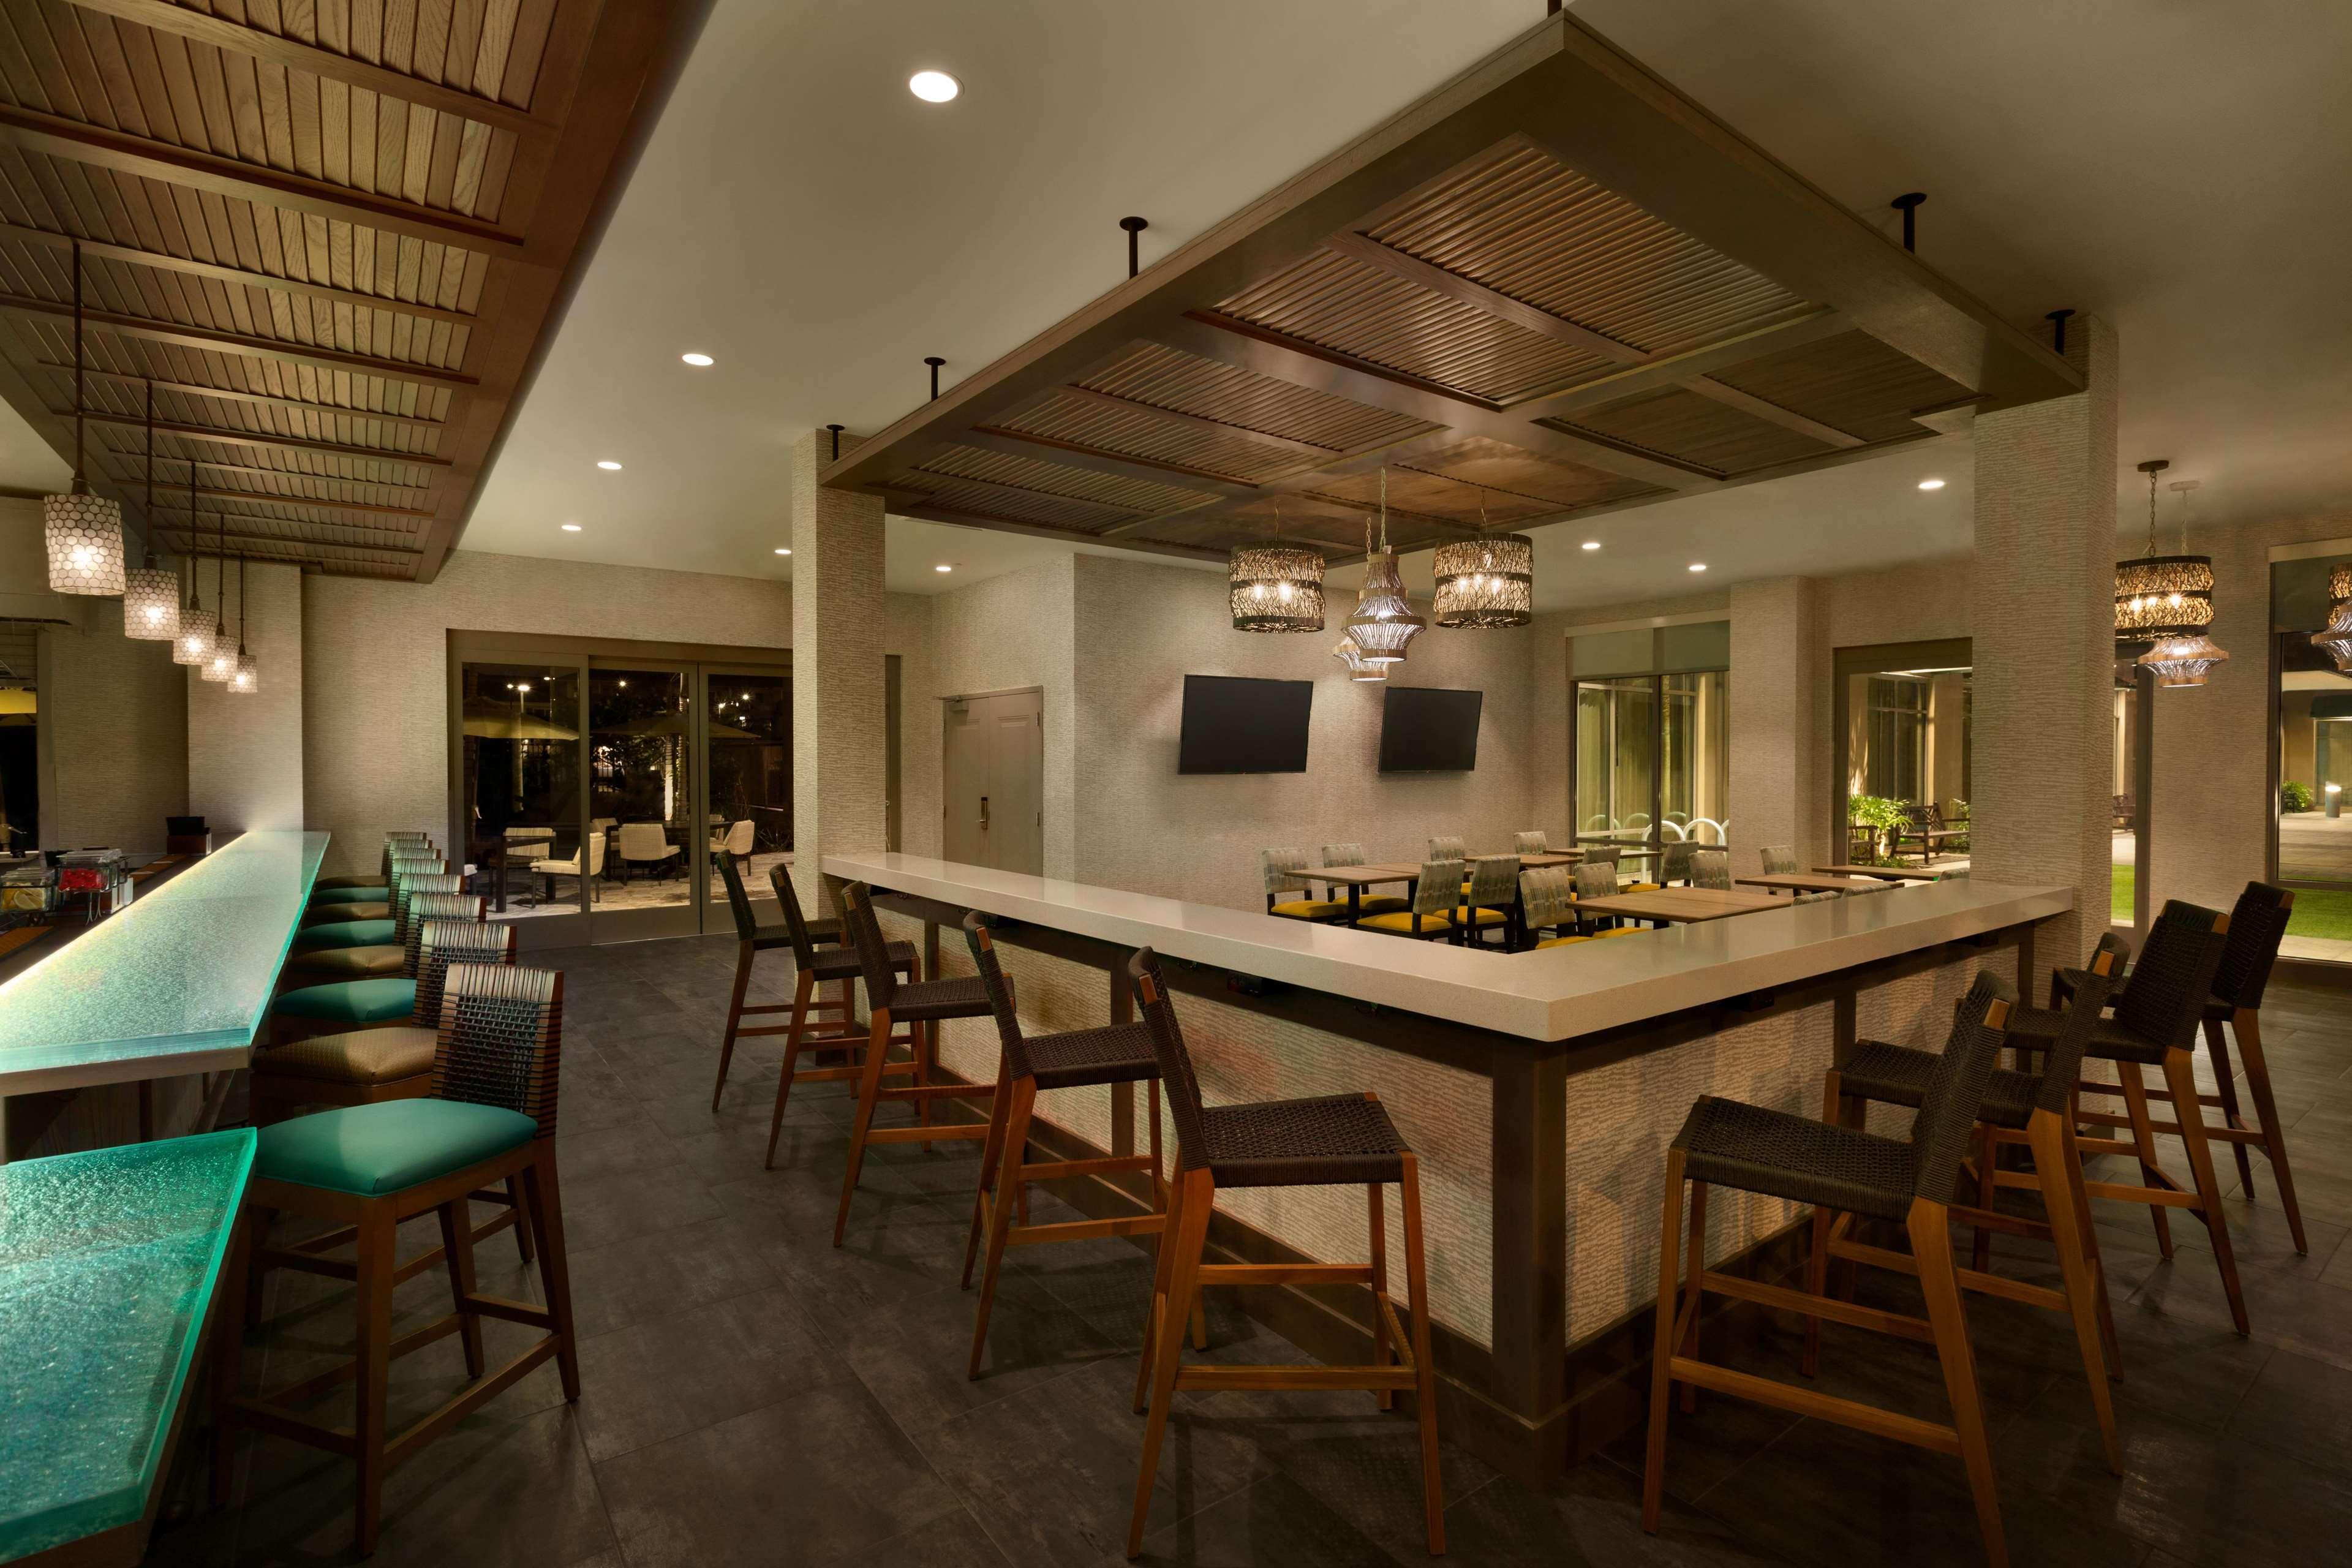 Embassy Suites by Hilton Oahu Kapolei image 44